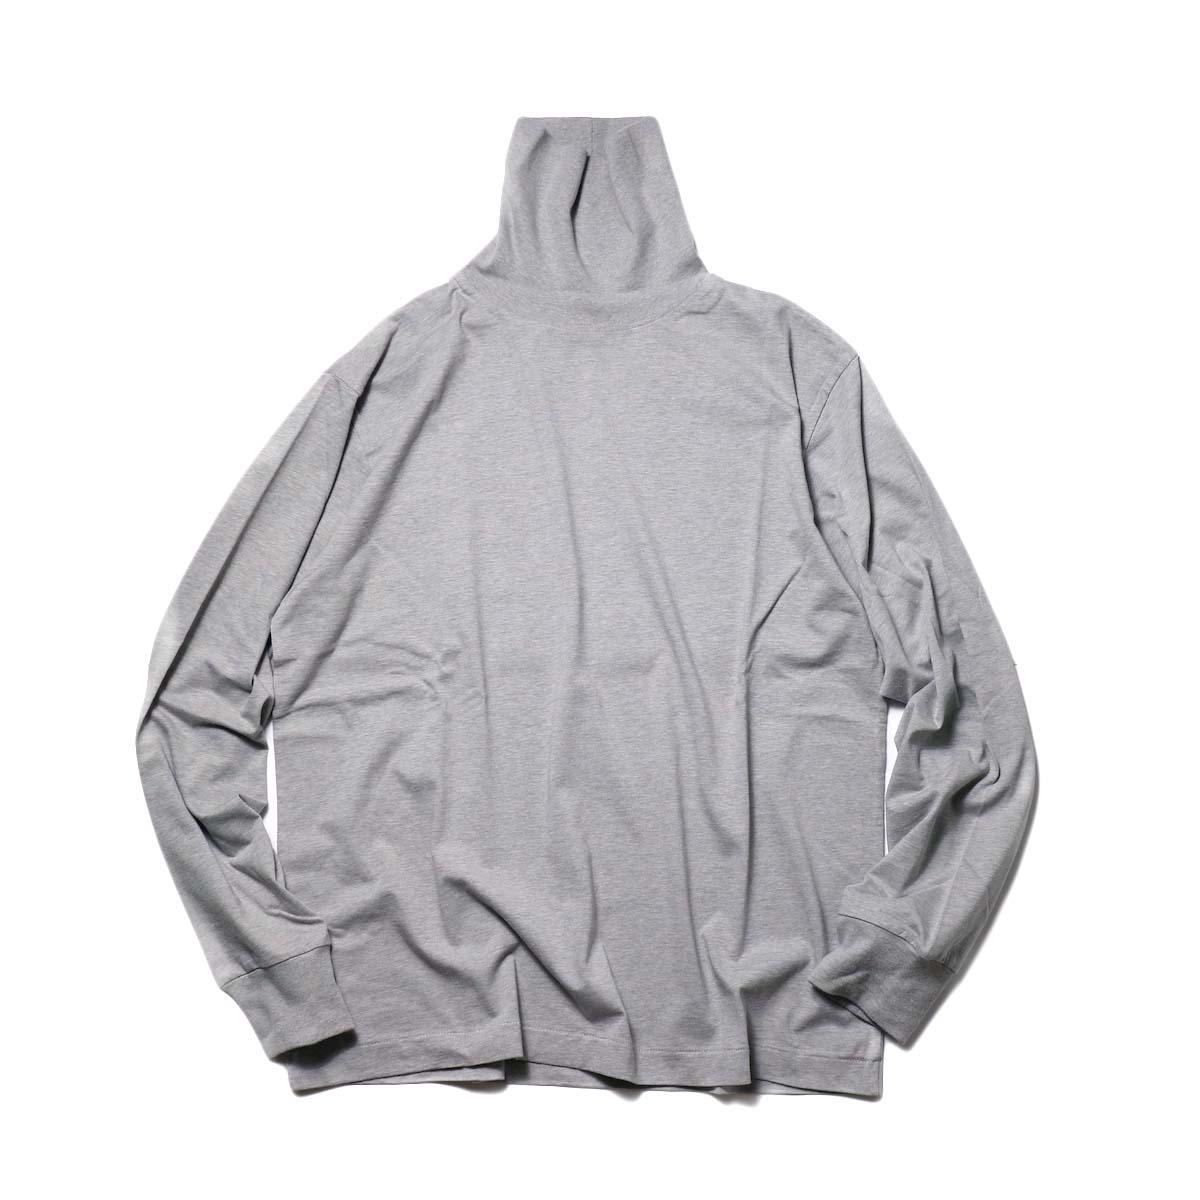 blurhms / Silk Cotton Jersey Turtle Neck L/S (HeatherGrey)